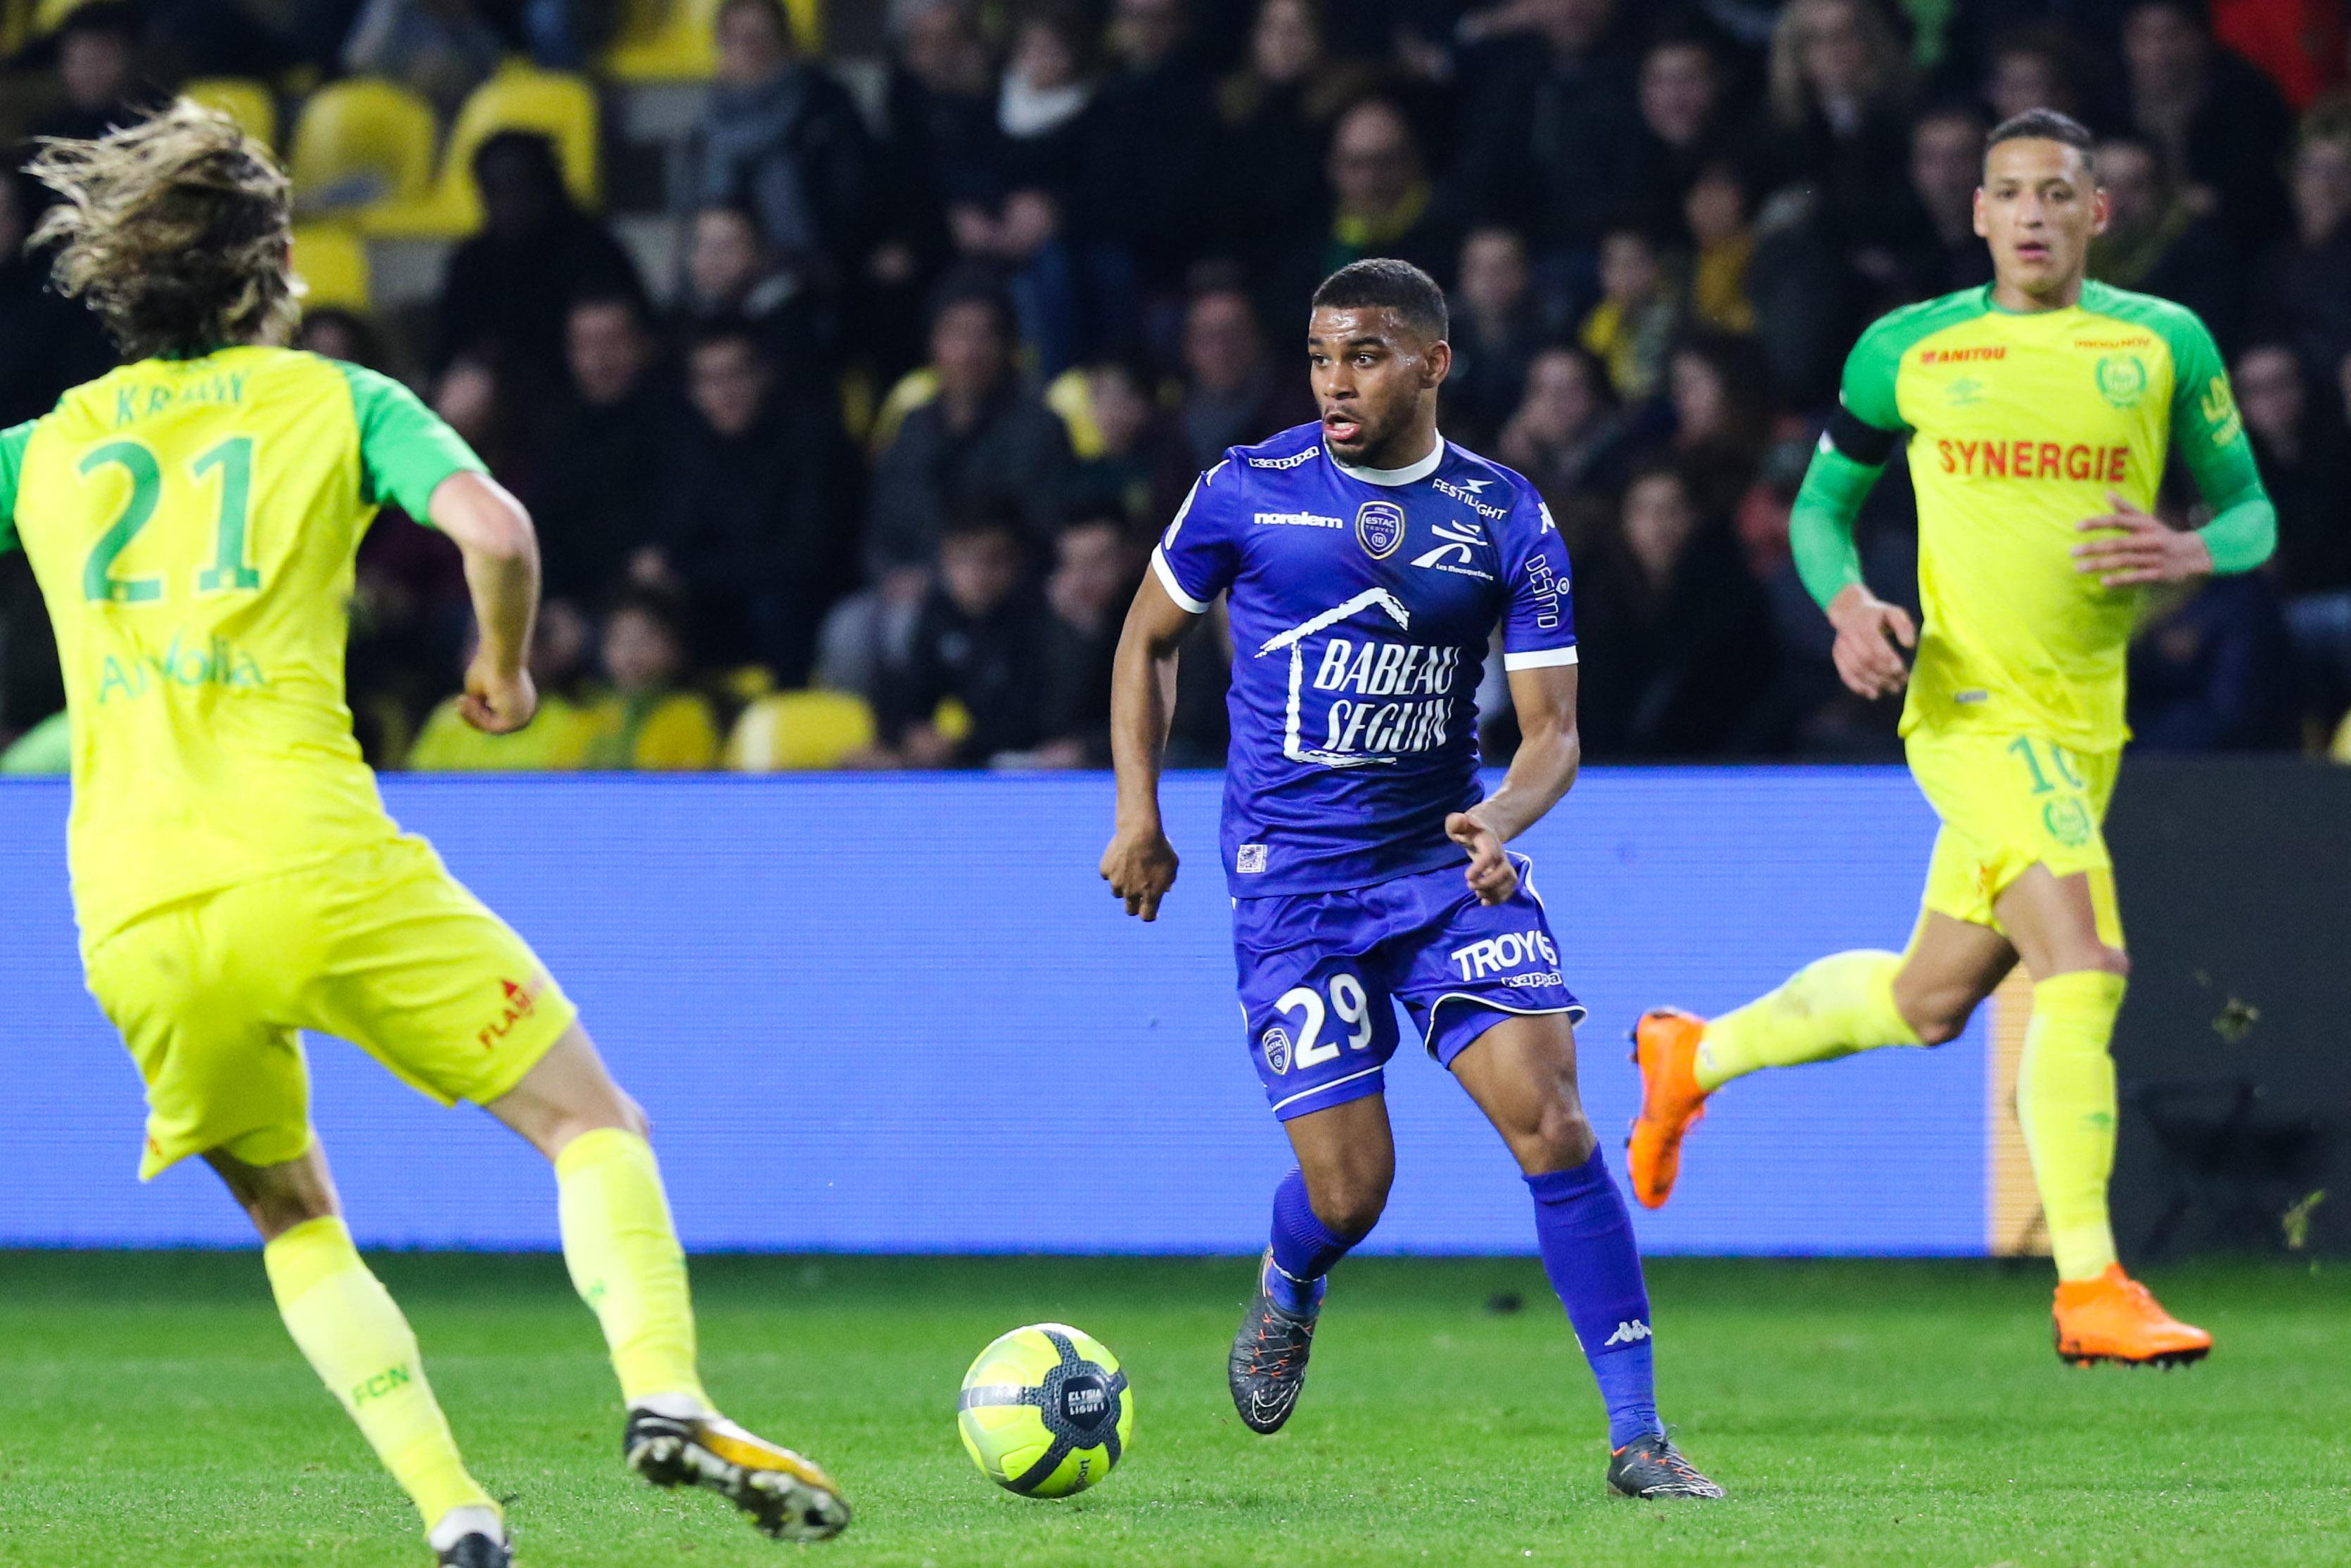 Nantes v Troyes AC - Ligue 1